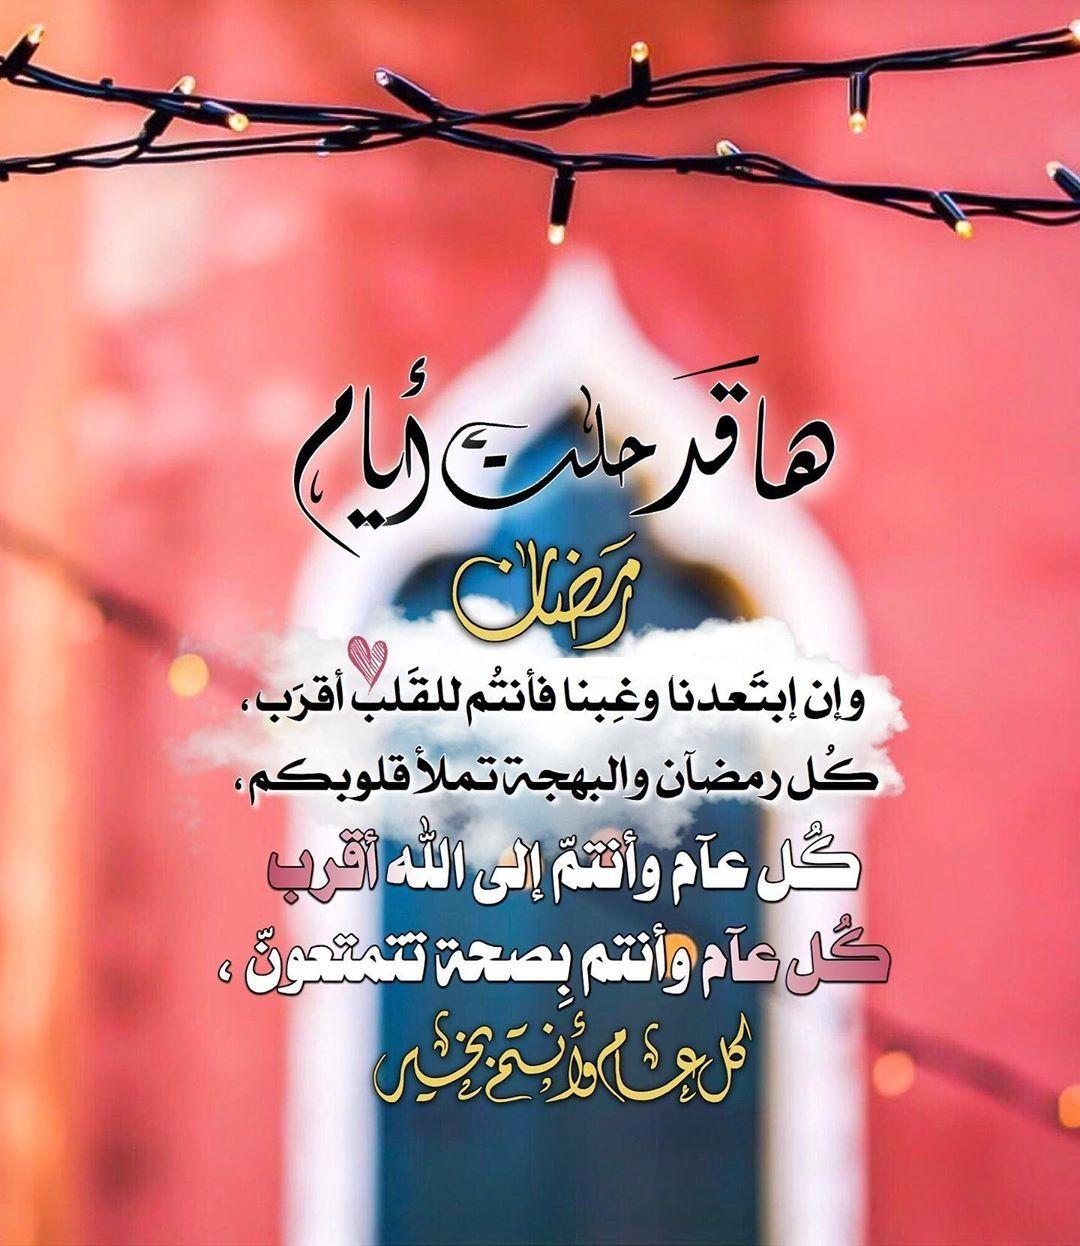 Pin By رغــــــد On رمــــضــان Ramadan Arabic Poetry Ramadan Mubarak